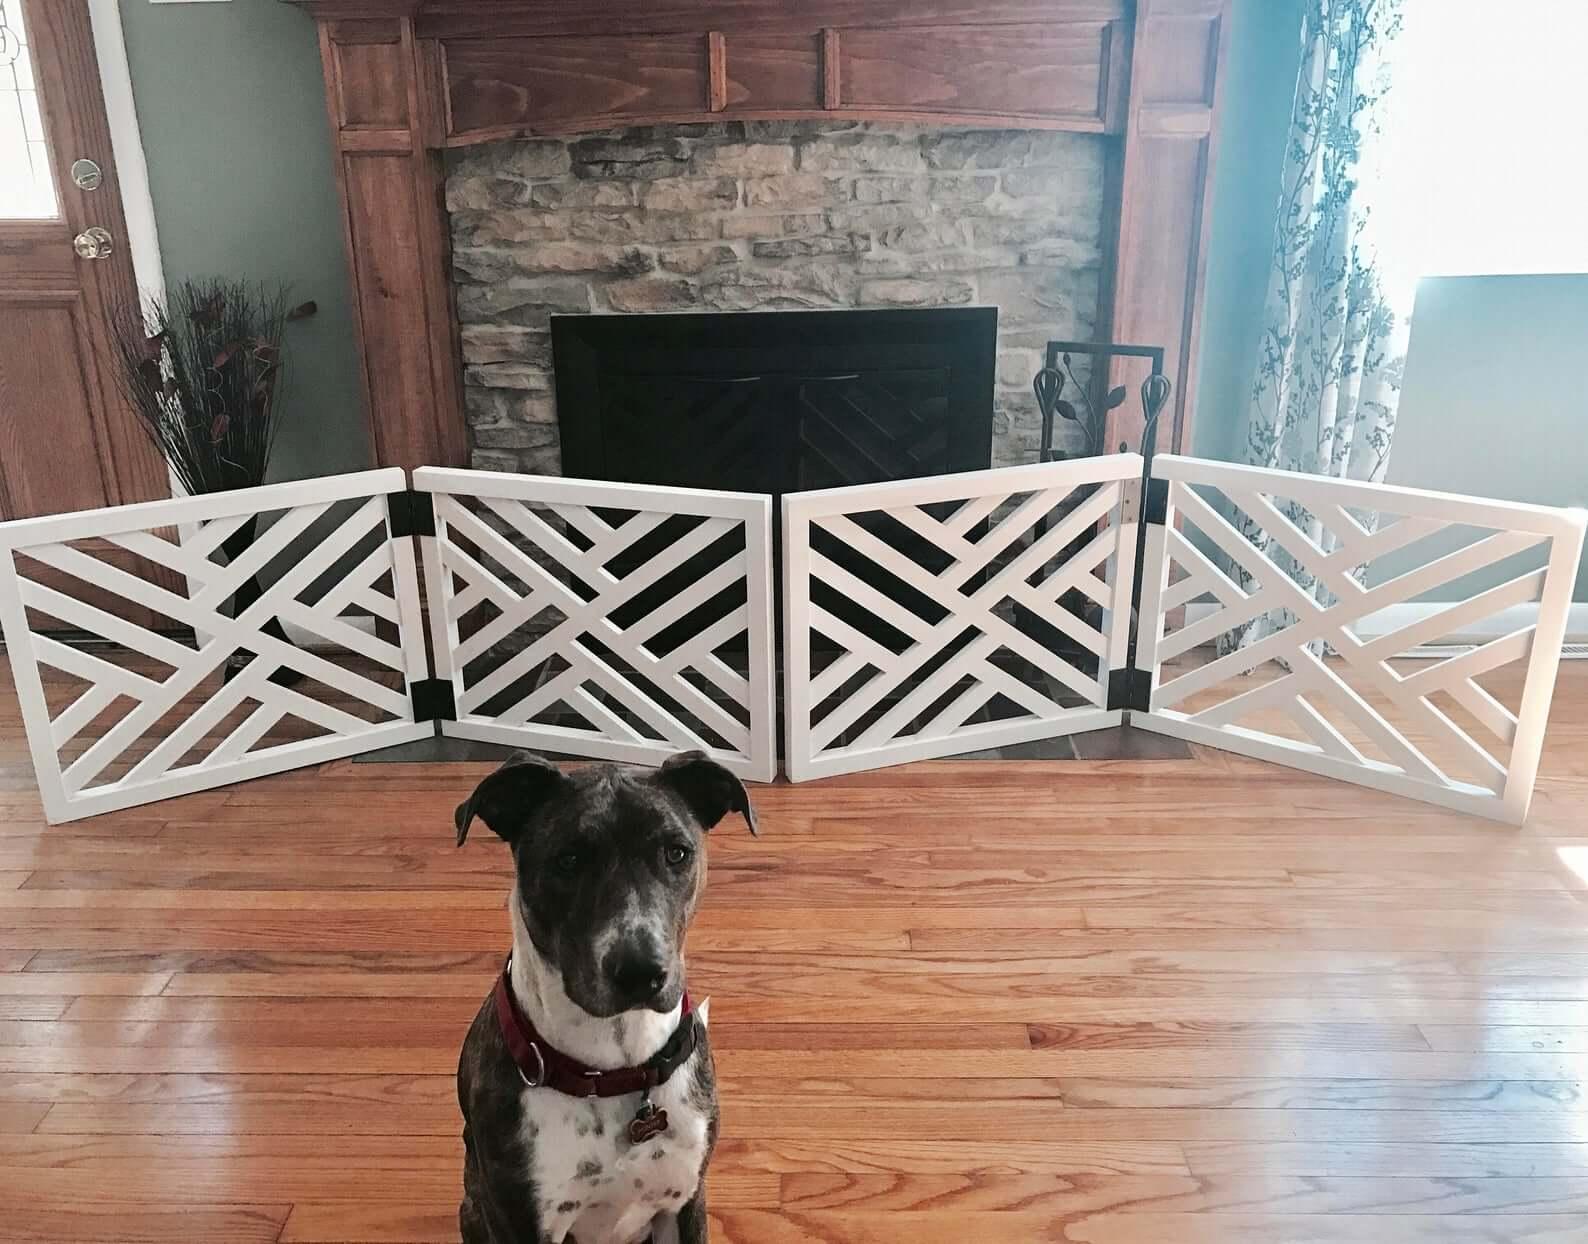 pet-friendly room divider